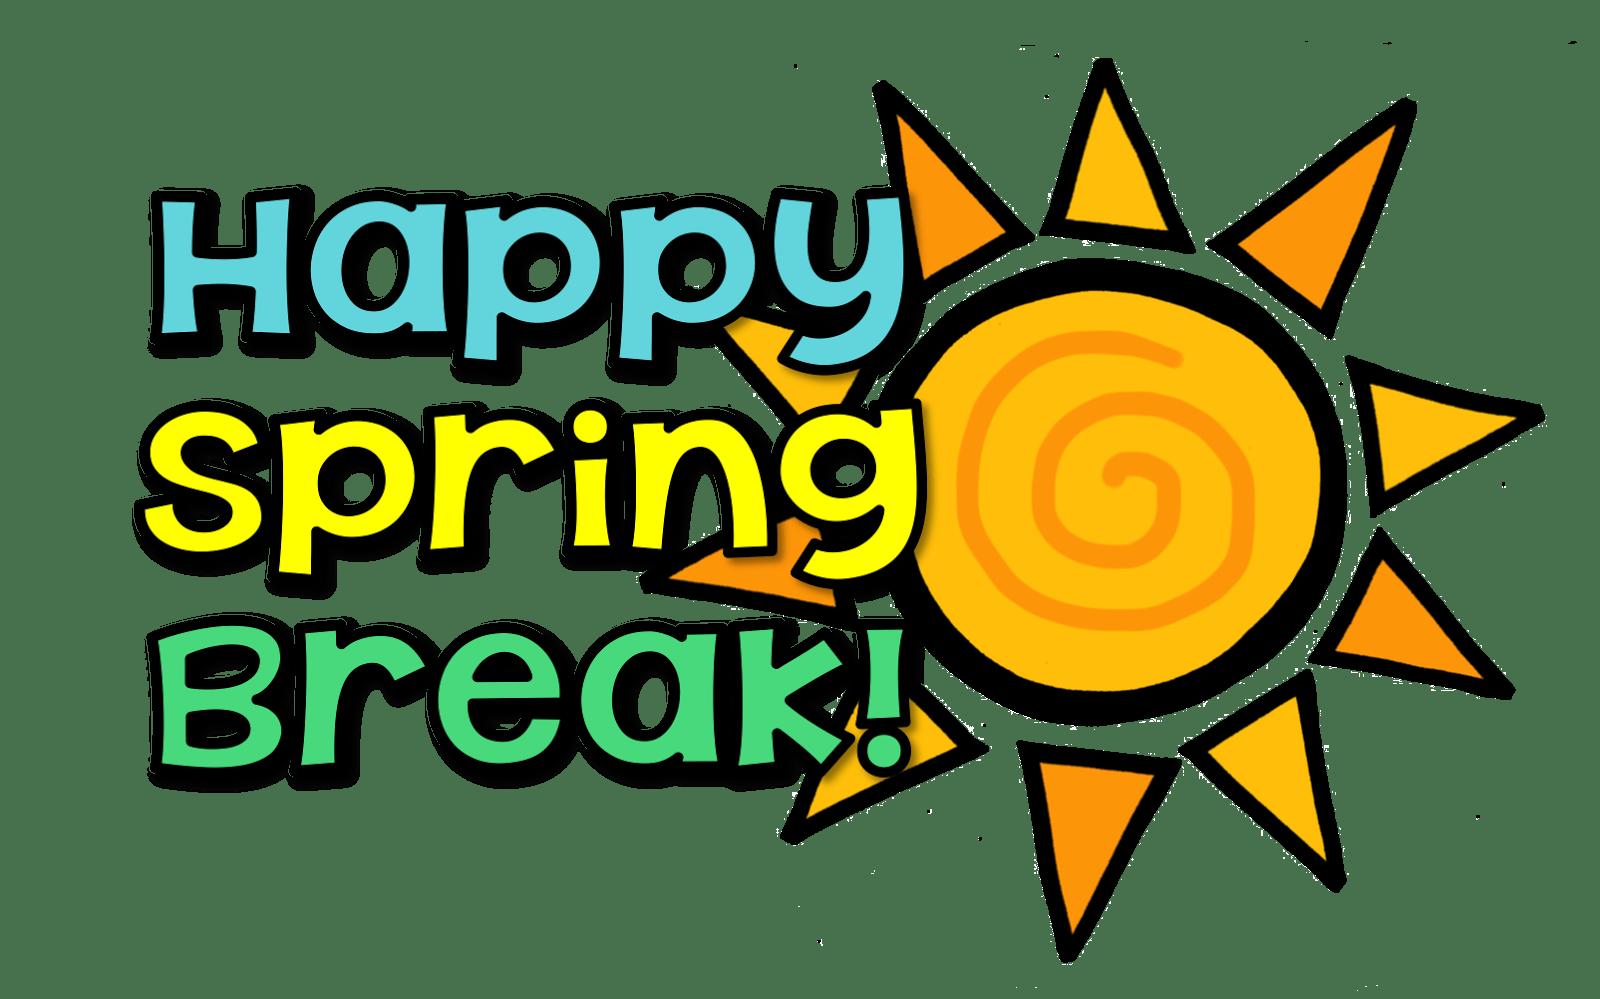 Clipart school spring break, Clipart school spring break Transparent FREE  for download on WebStockReview 2021